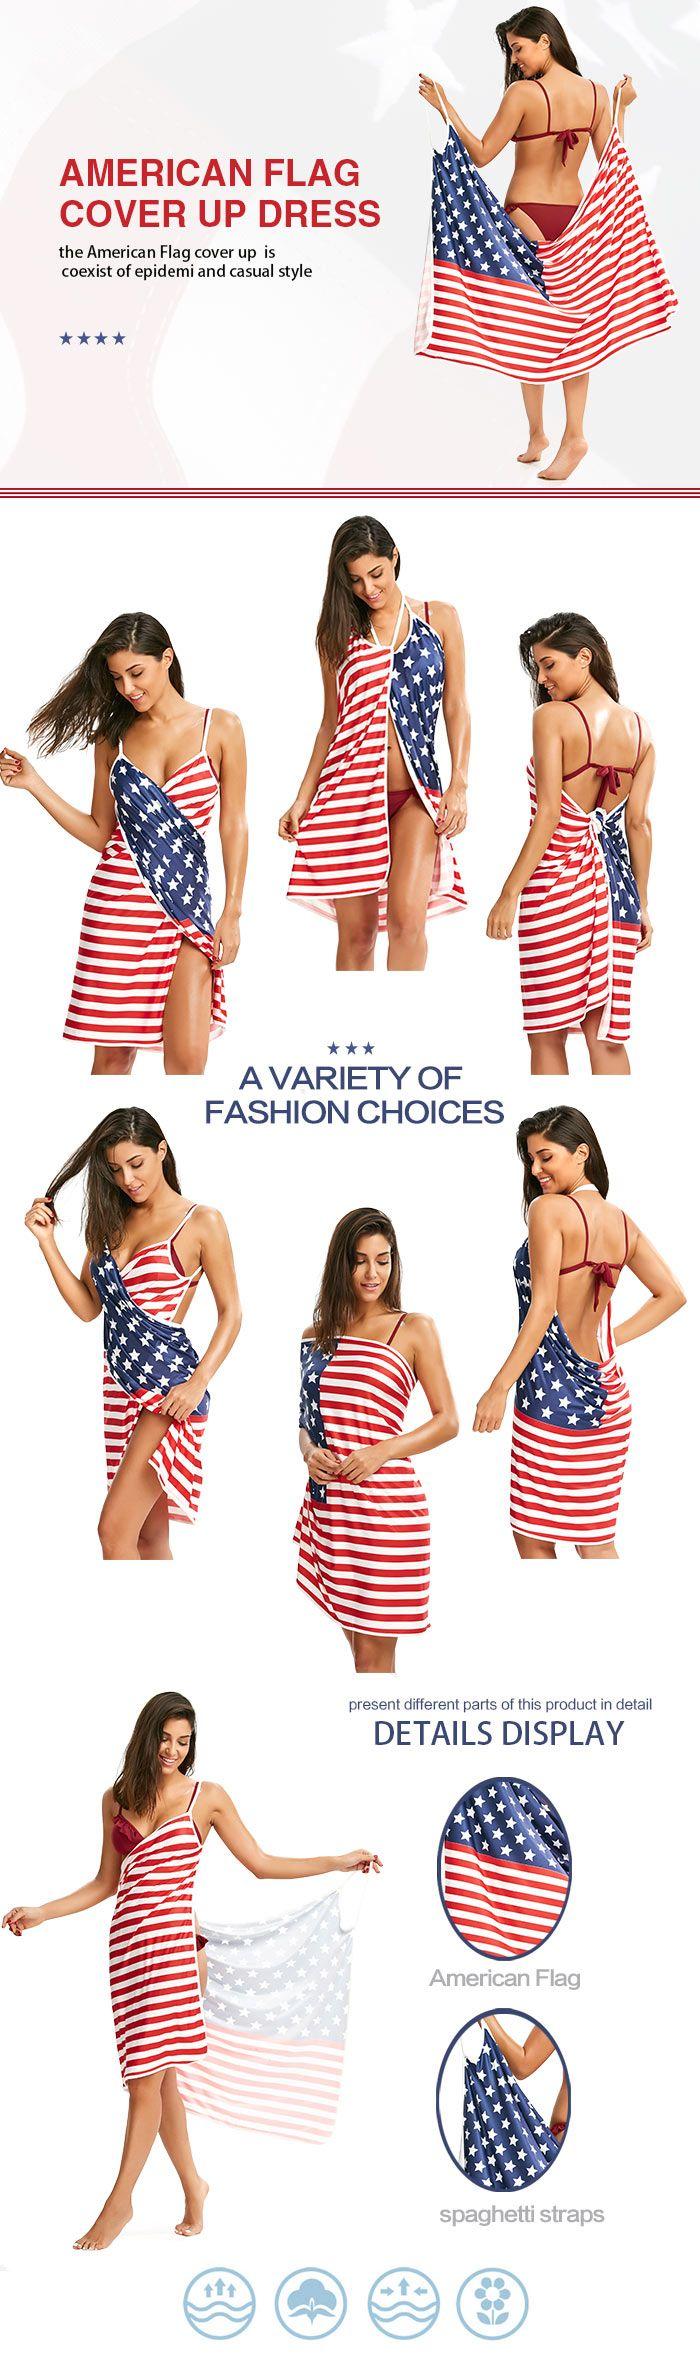 Patriotic Cover Up American Flag Slip Dress